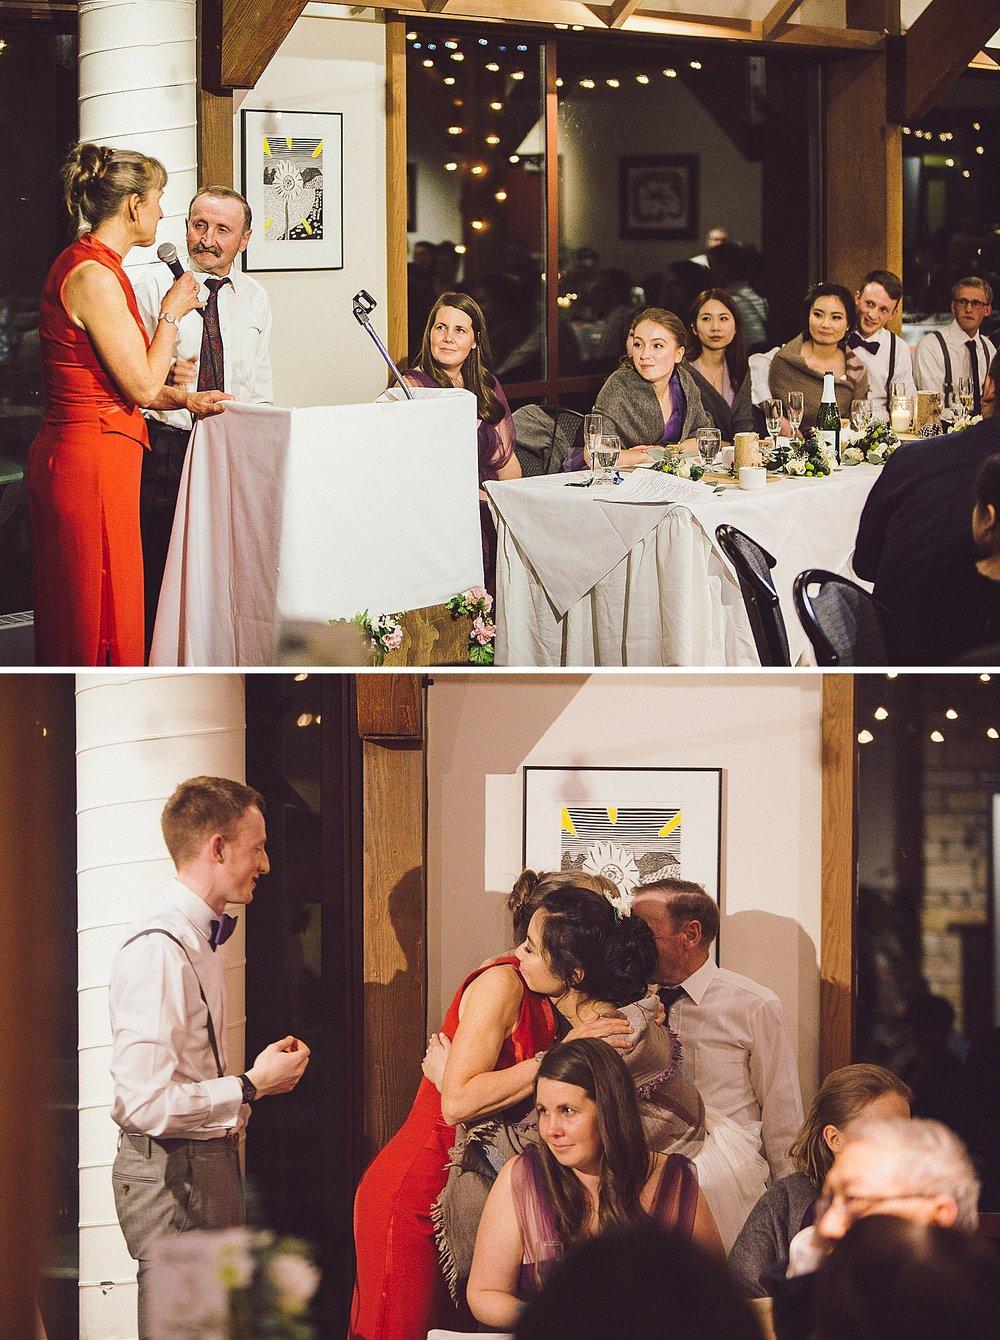 Groom's parents speak at the wedding reception